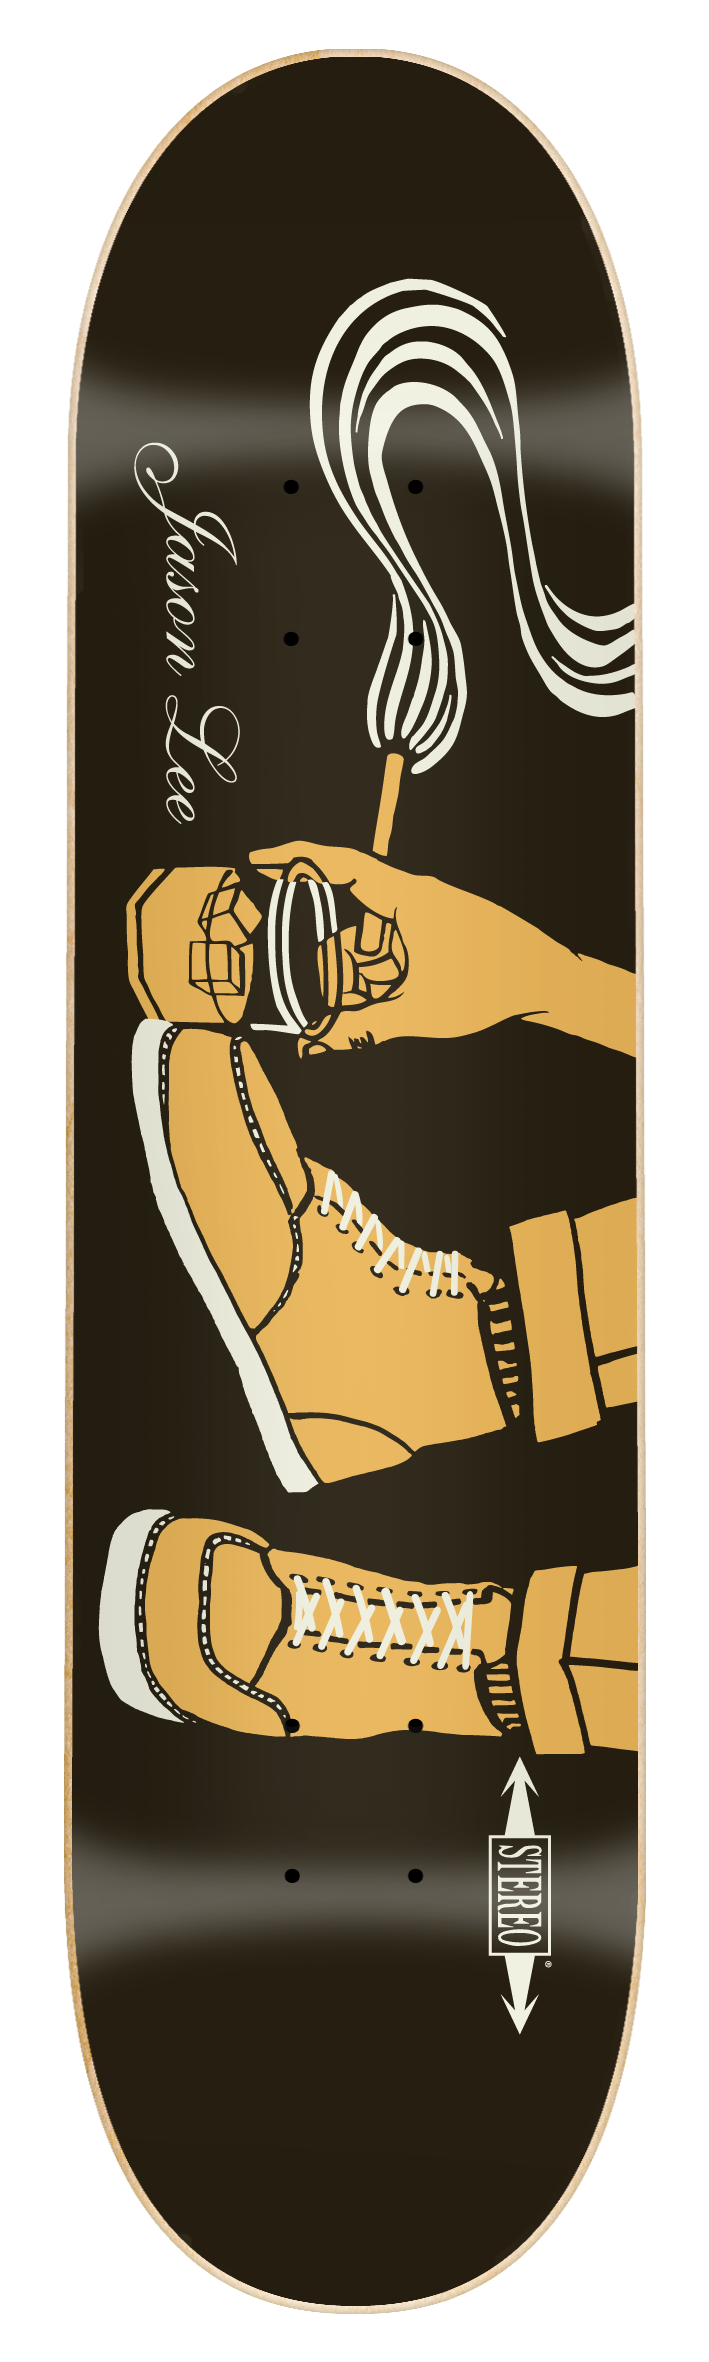 jlee-boots-brown-mockup.png